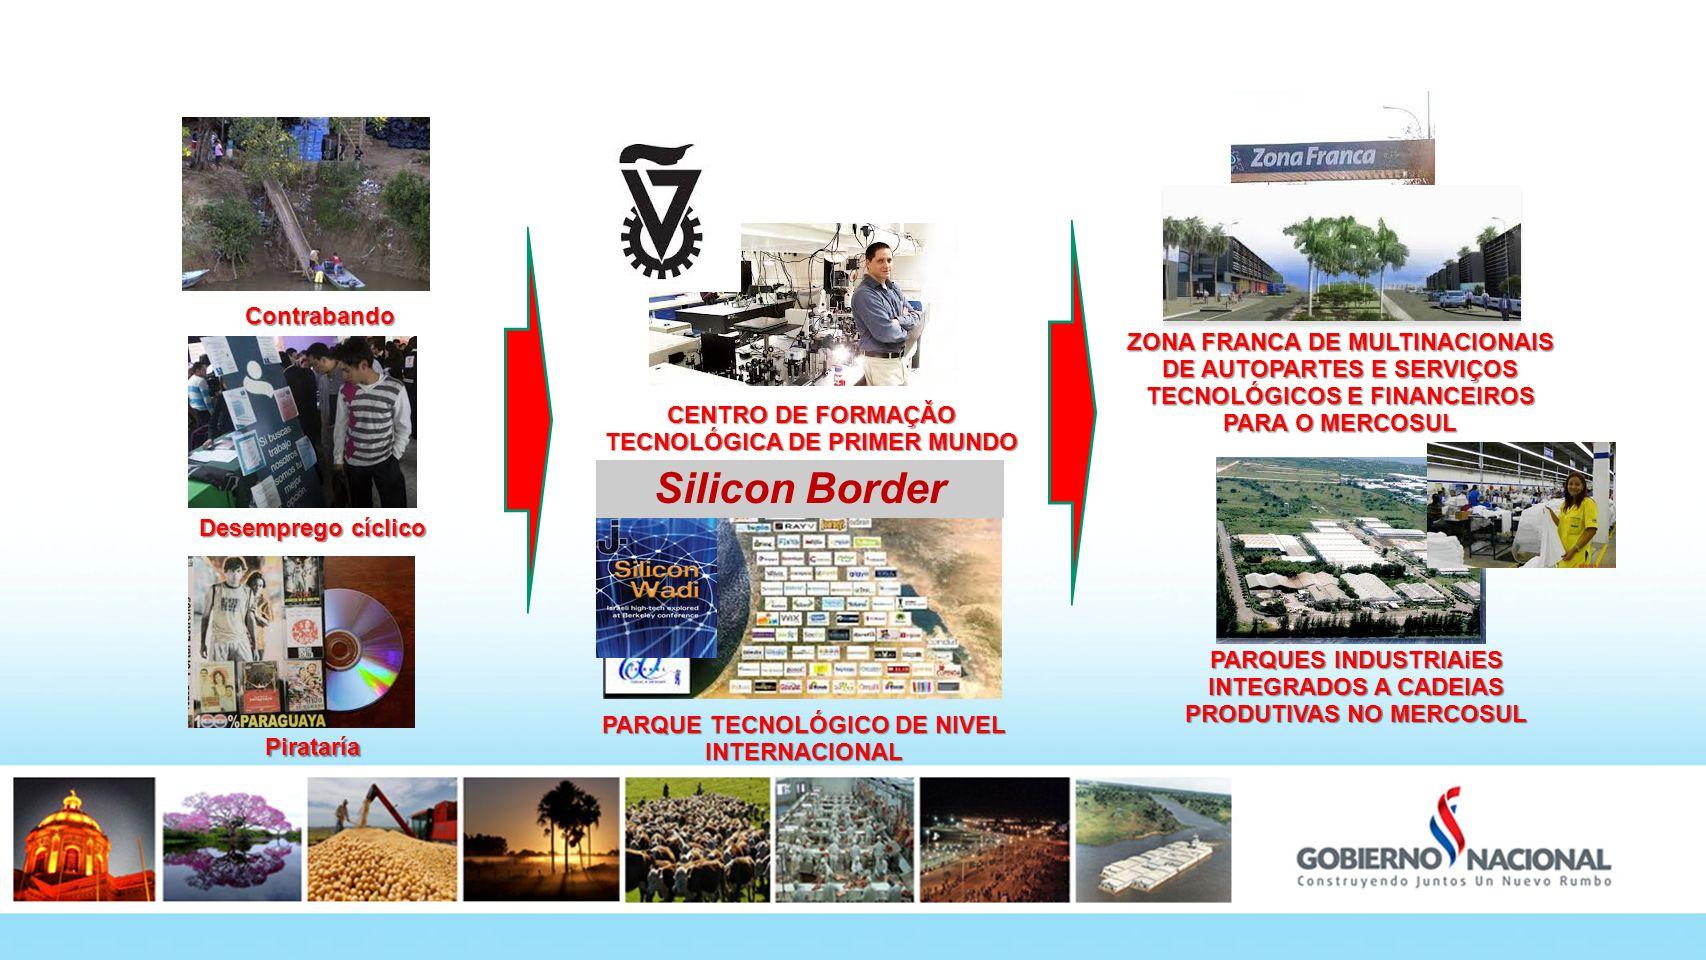 Fronteras 180º PARQUE TECNOLÓGICO DE NIVEL INTERNACIONAL CENTRO DE FORMAÇǍO TECNOLÓGICA DE PRIMER MUNDO ZONA FRANCA DE MULTINACIONAIS DE AUTOPARTES E